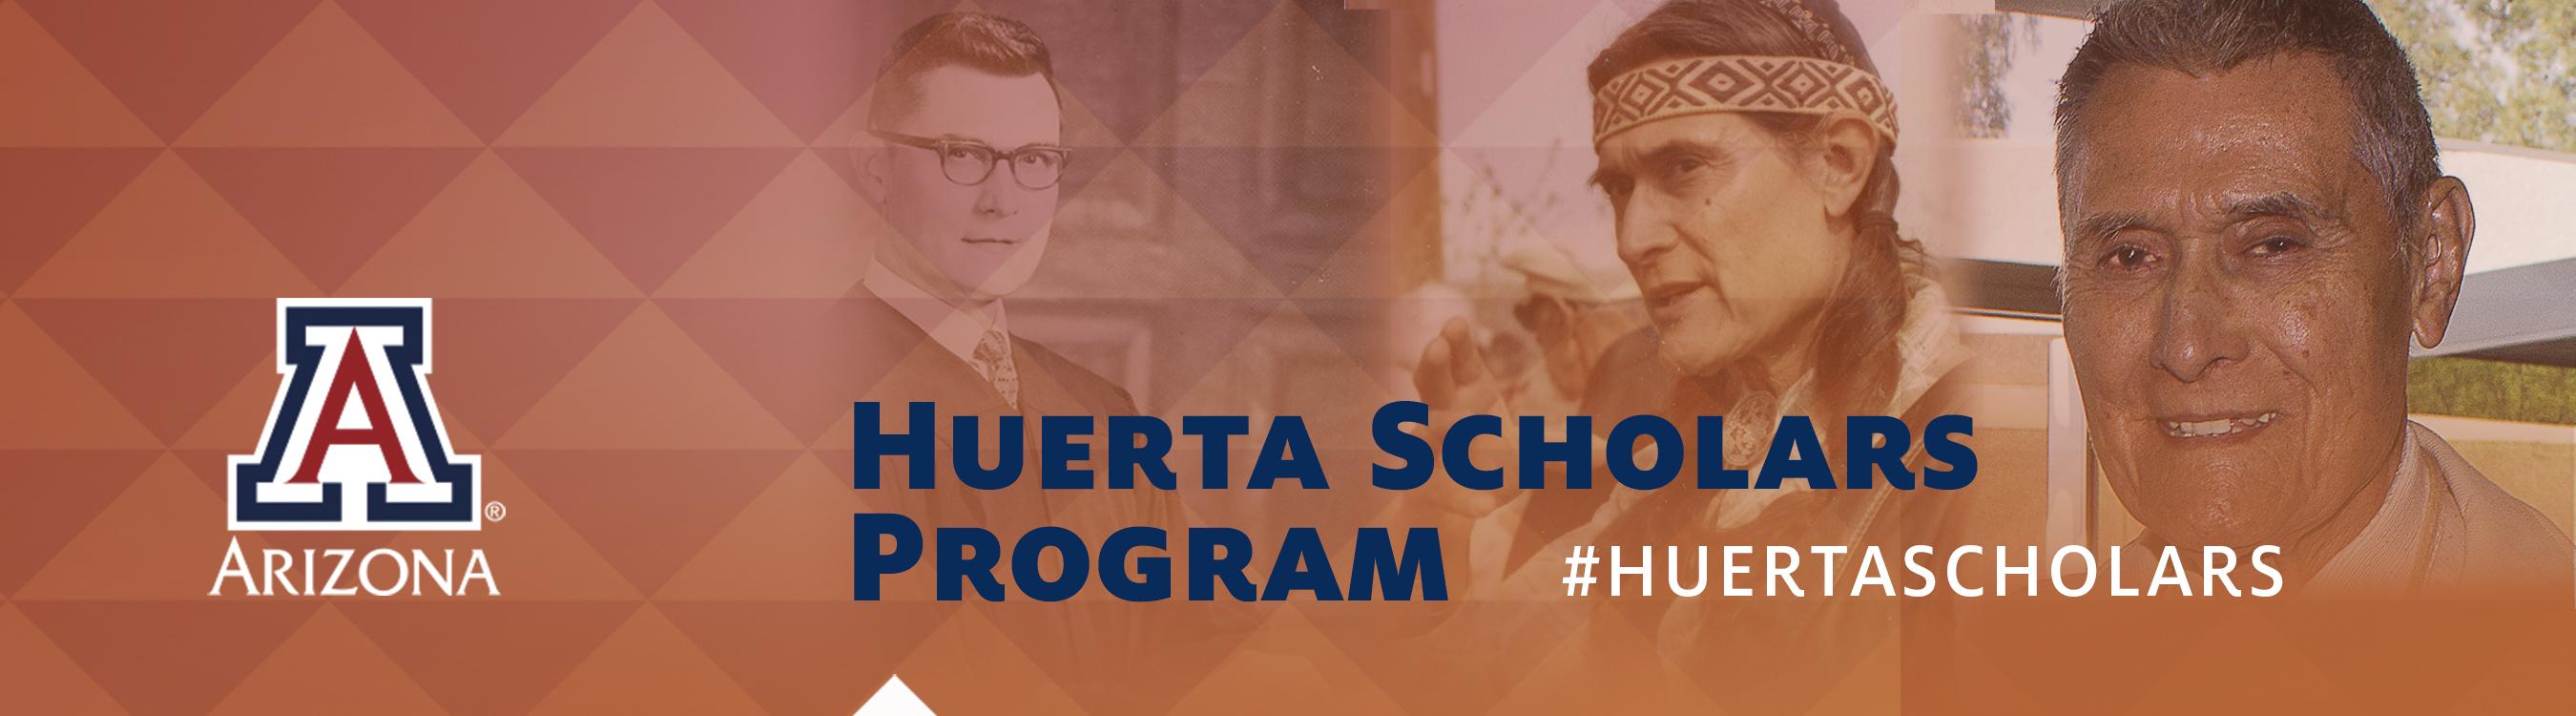 Huerta Scholars Program